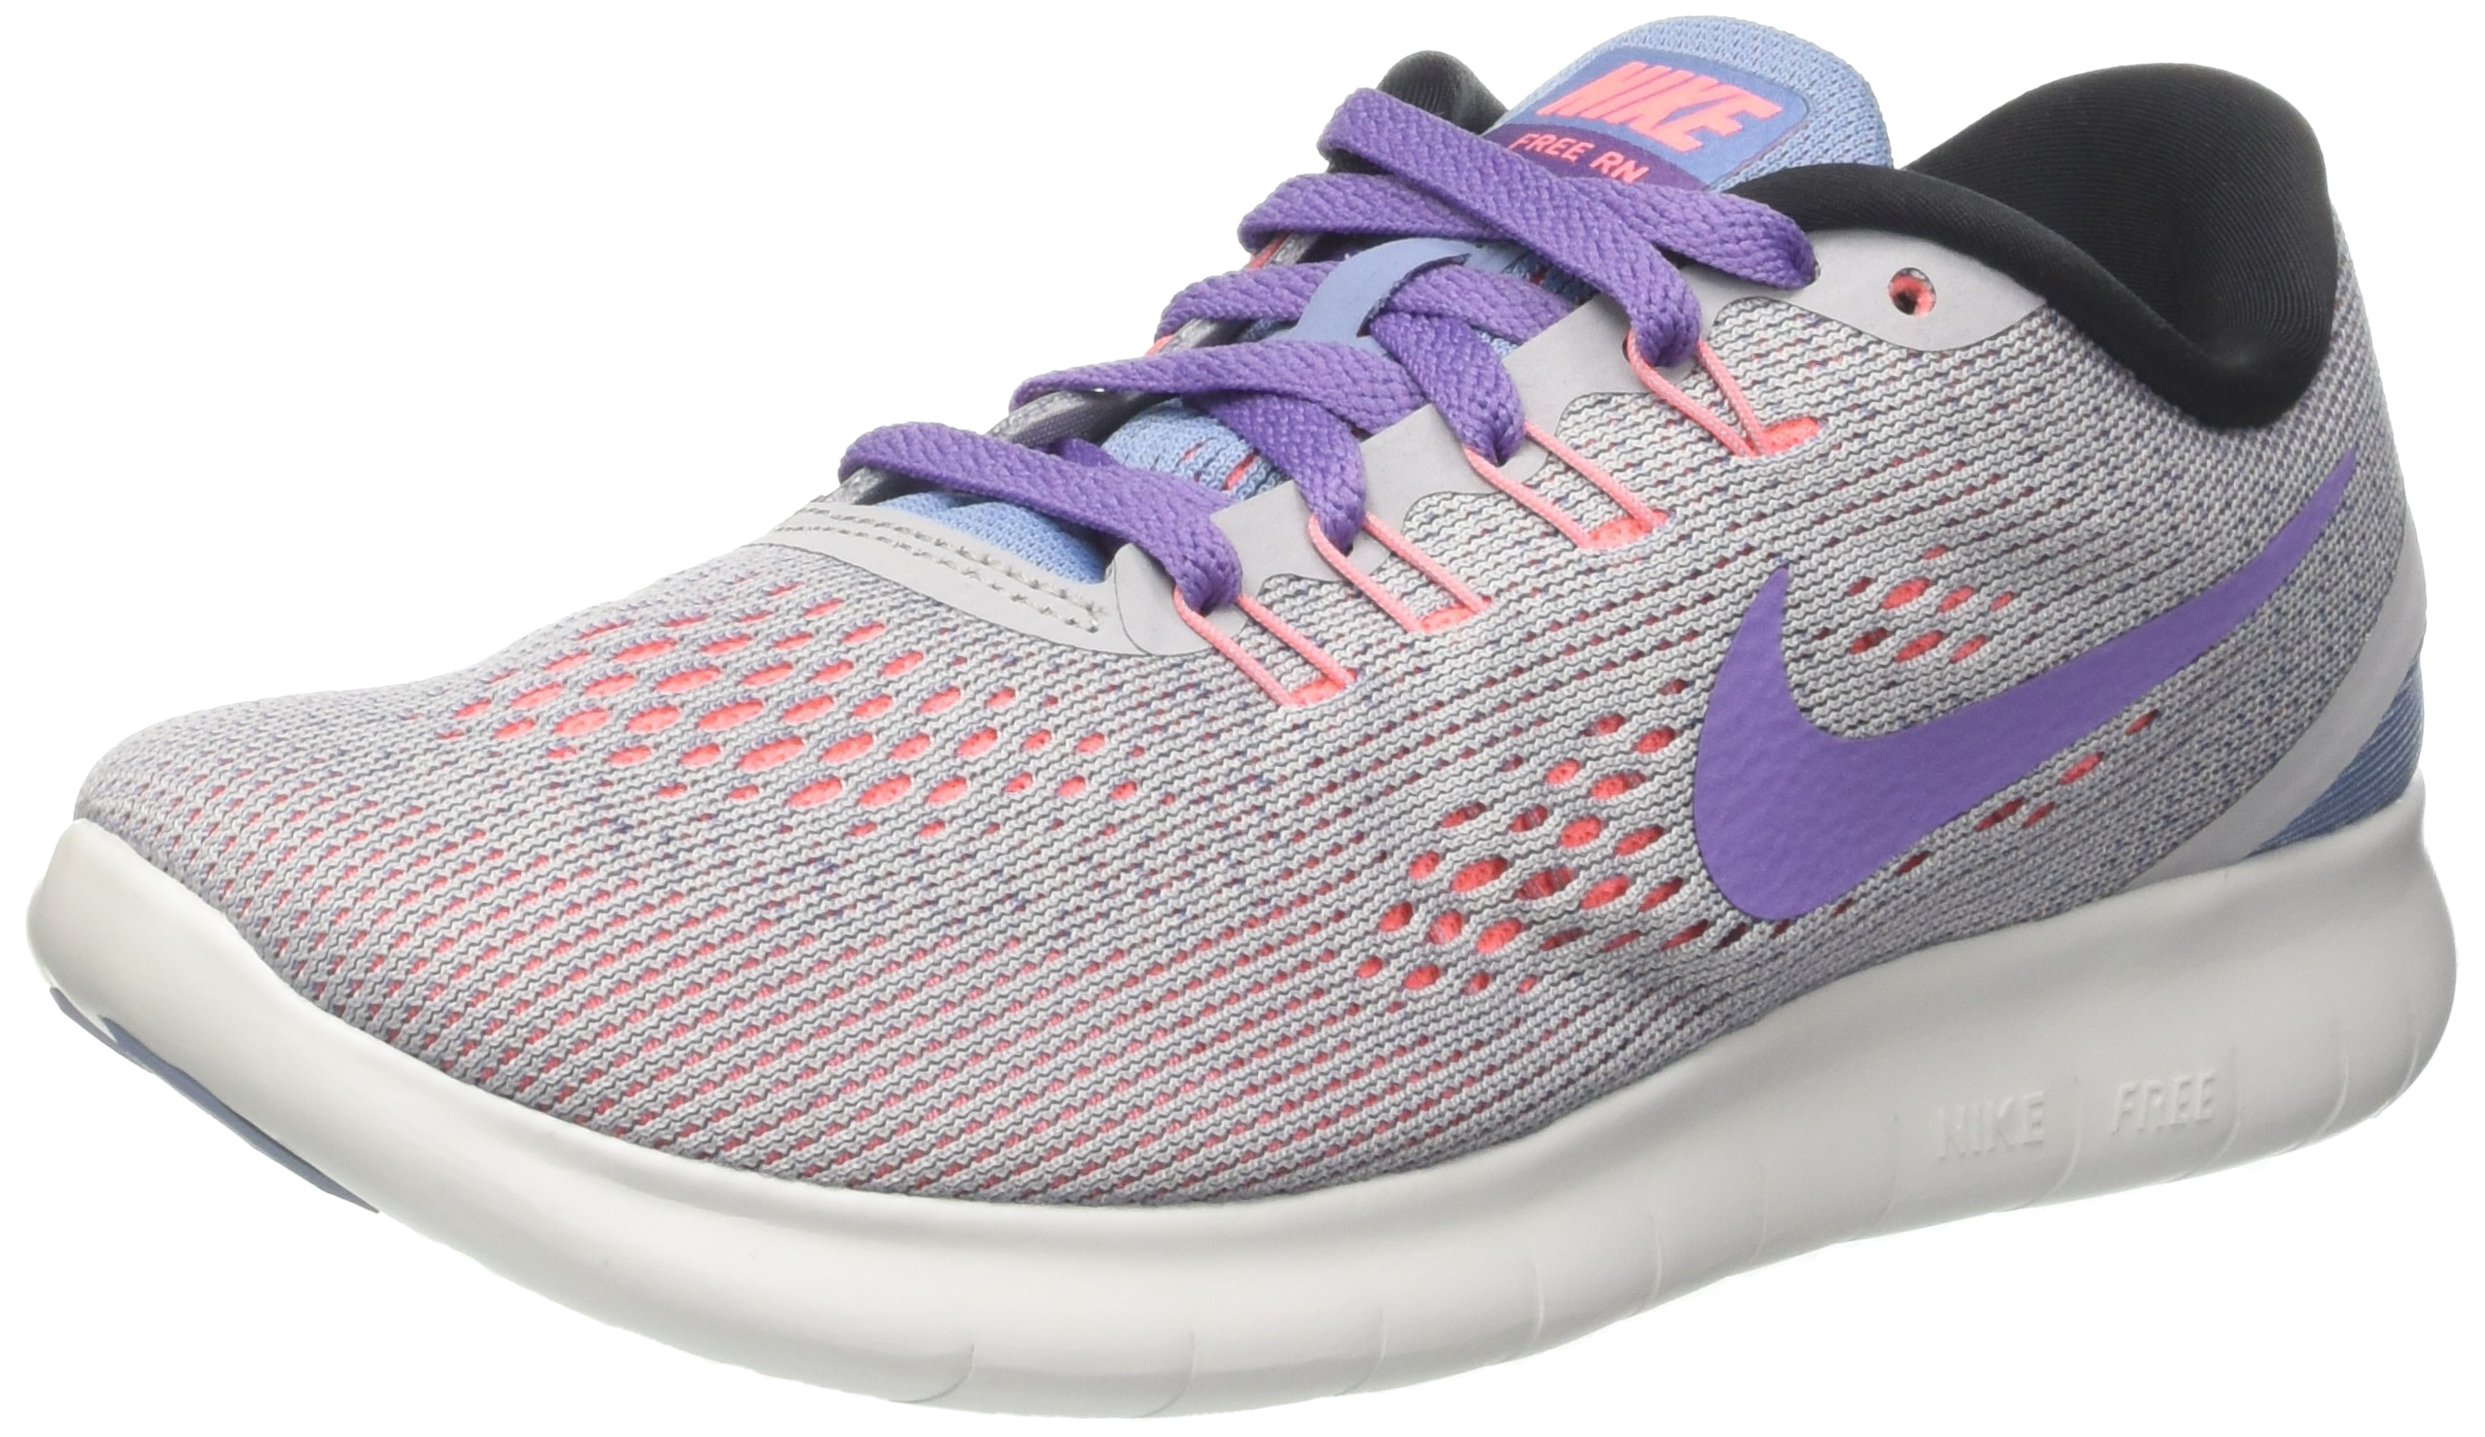 36aabdcf717b Galleon - NIKE Women s Free Rn Distance Running Shoe (5.5 B US